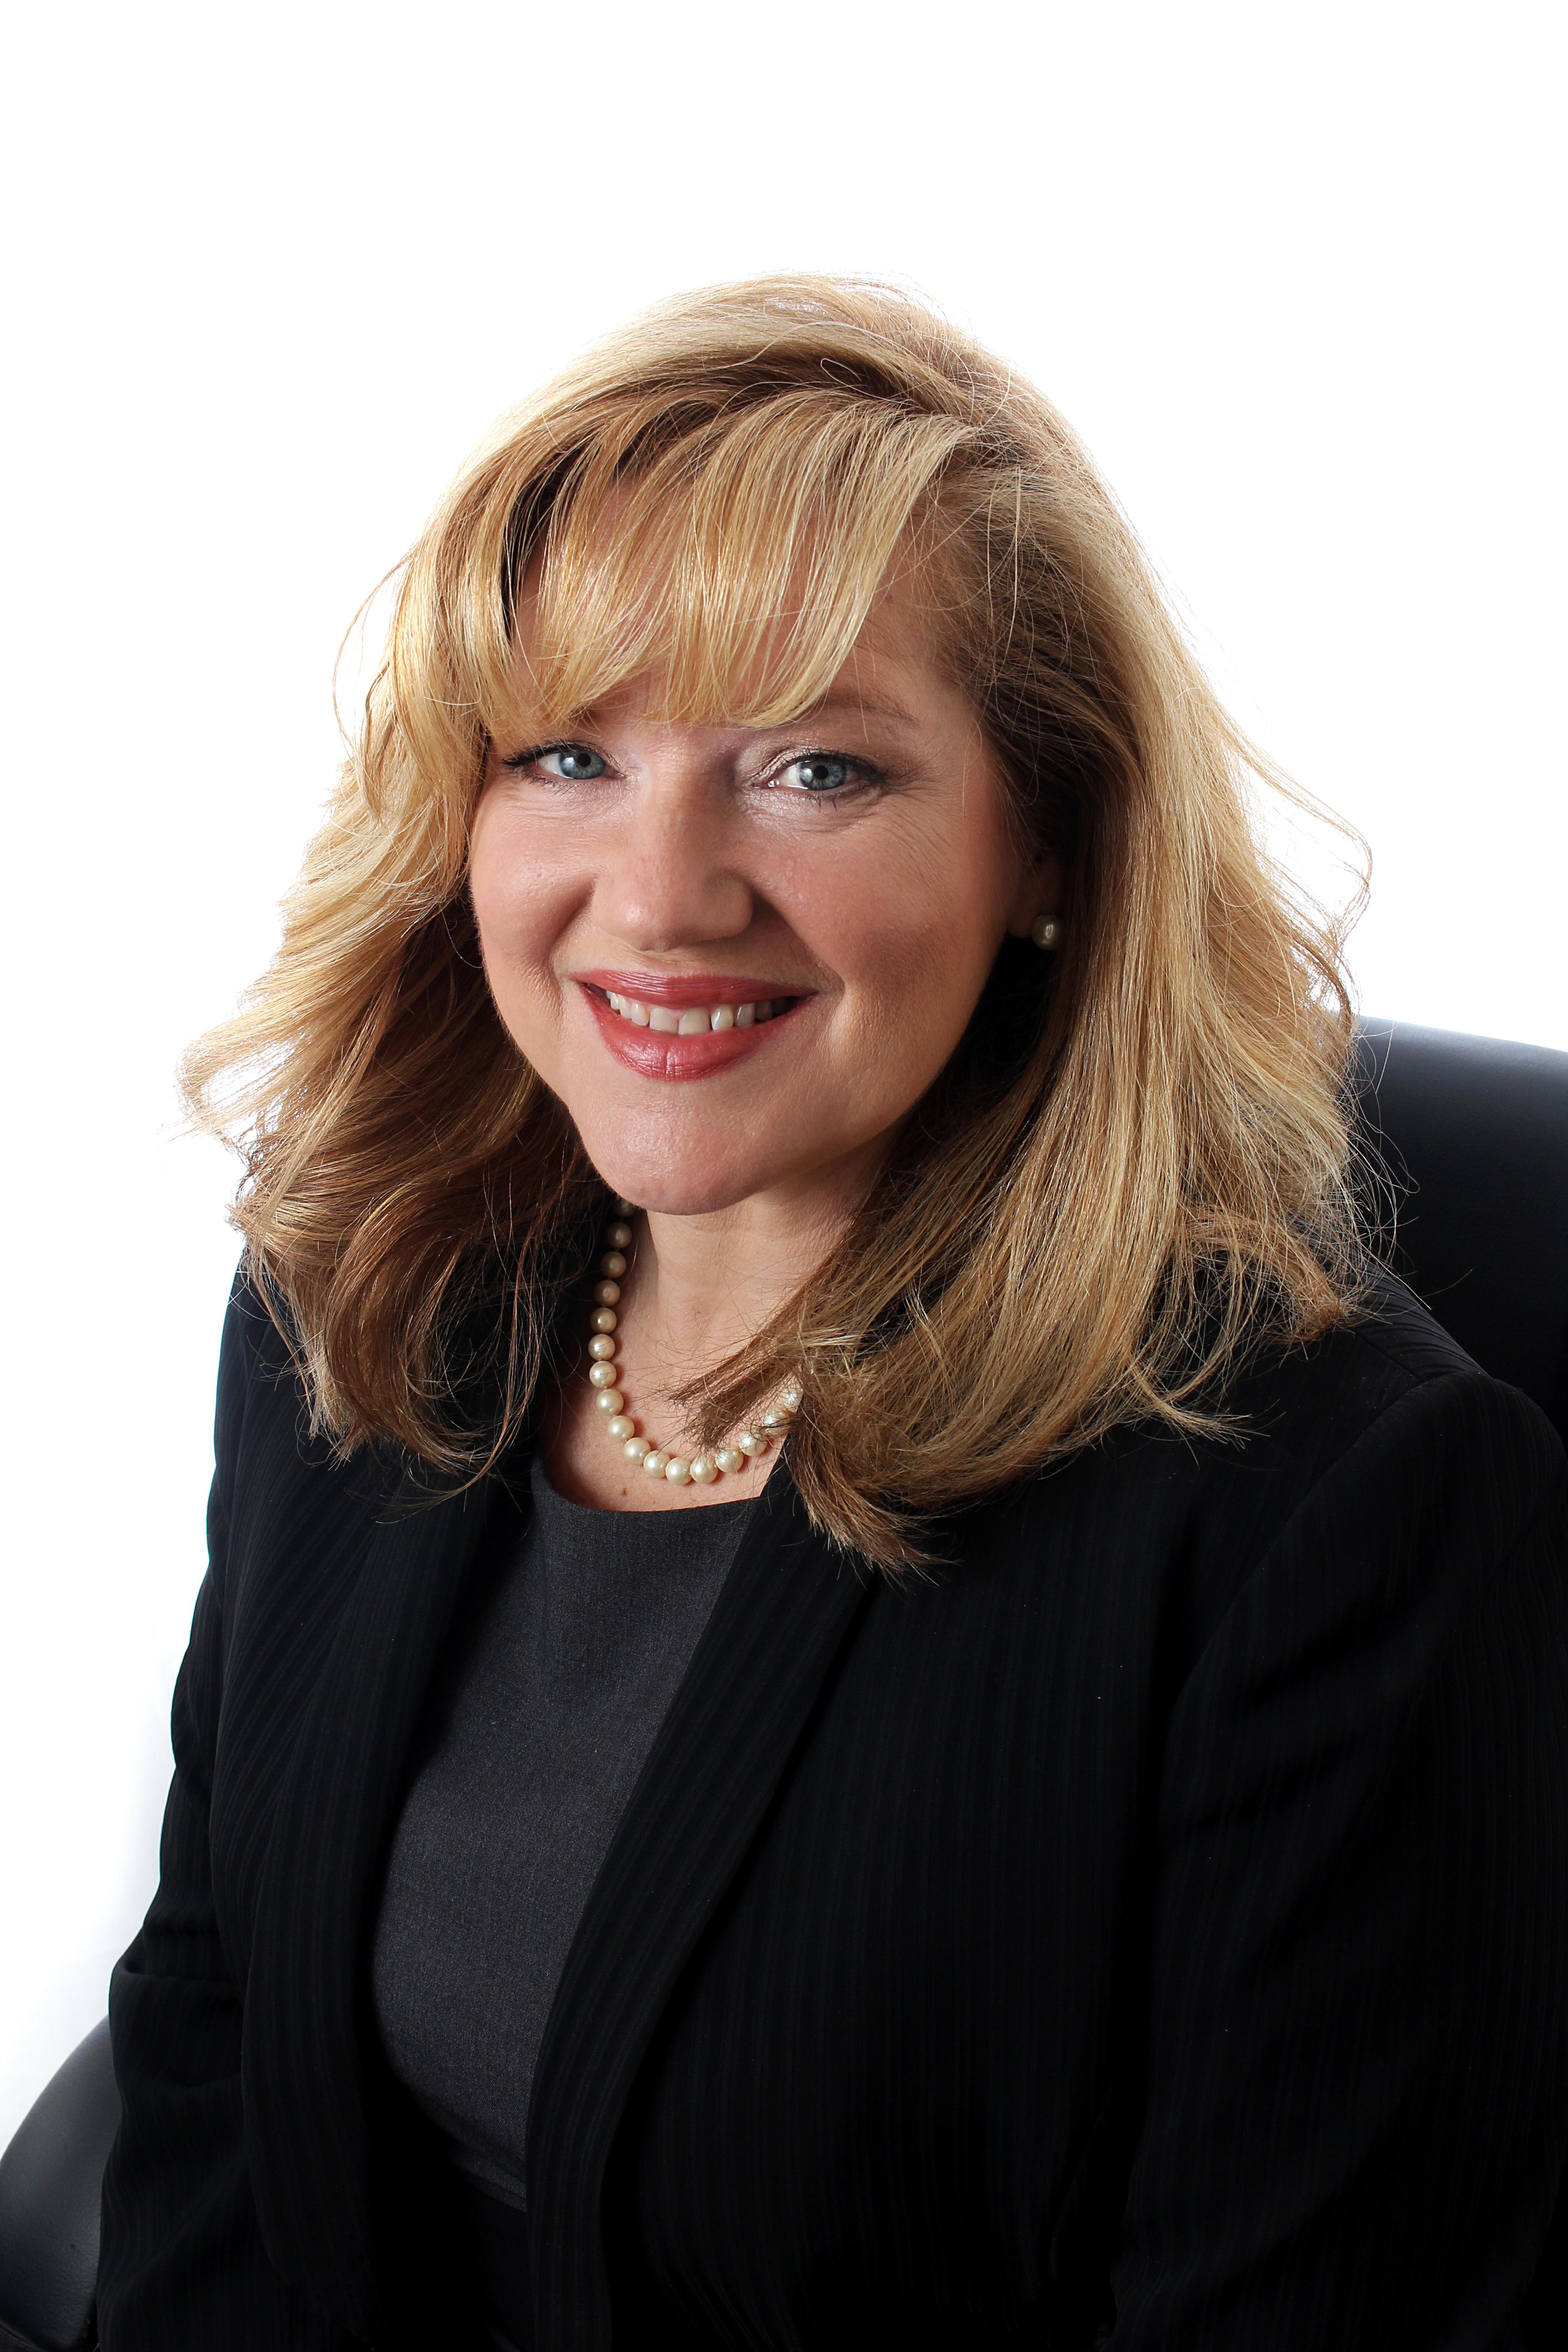 Maureen Tartaglione